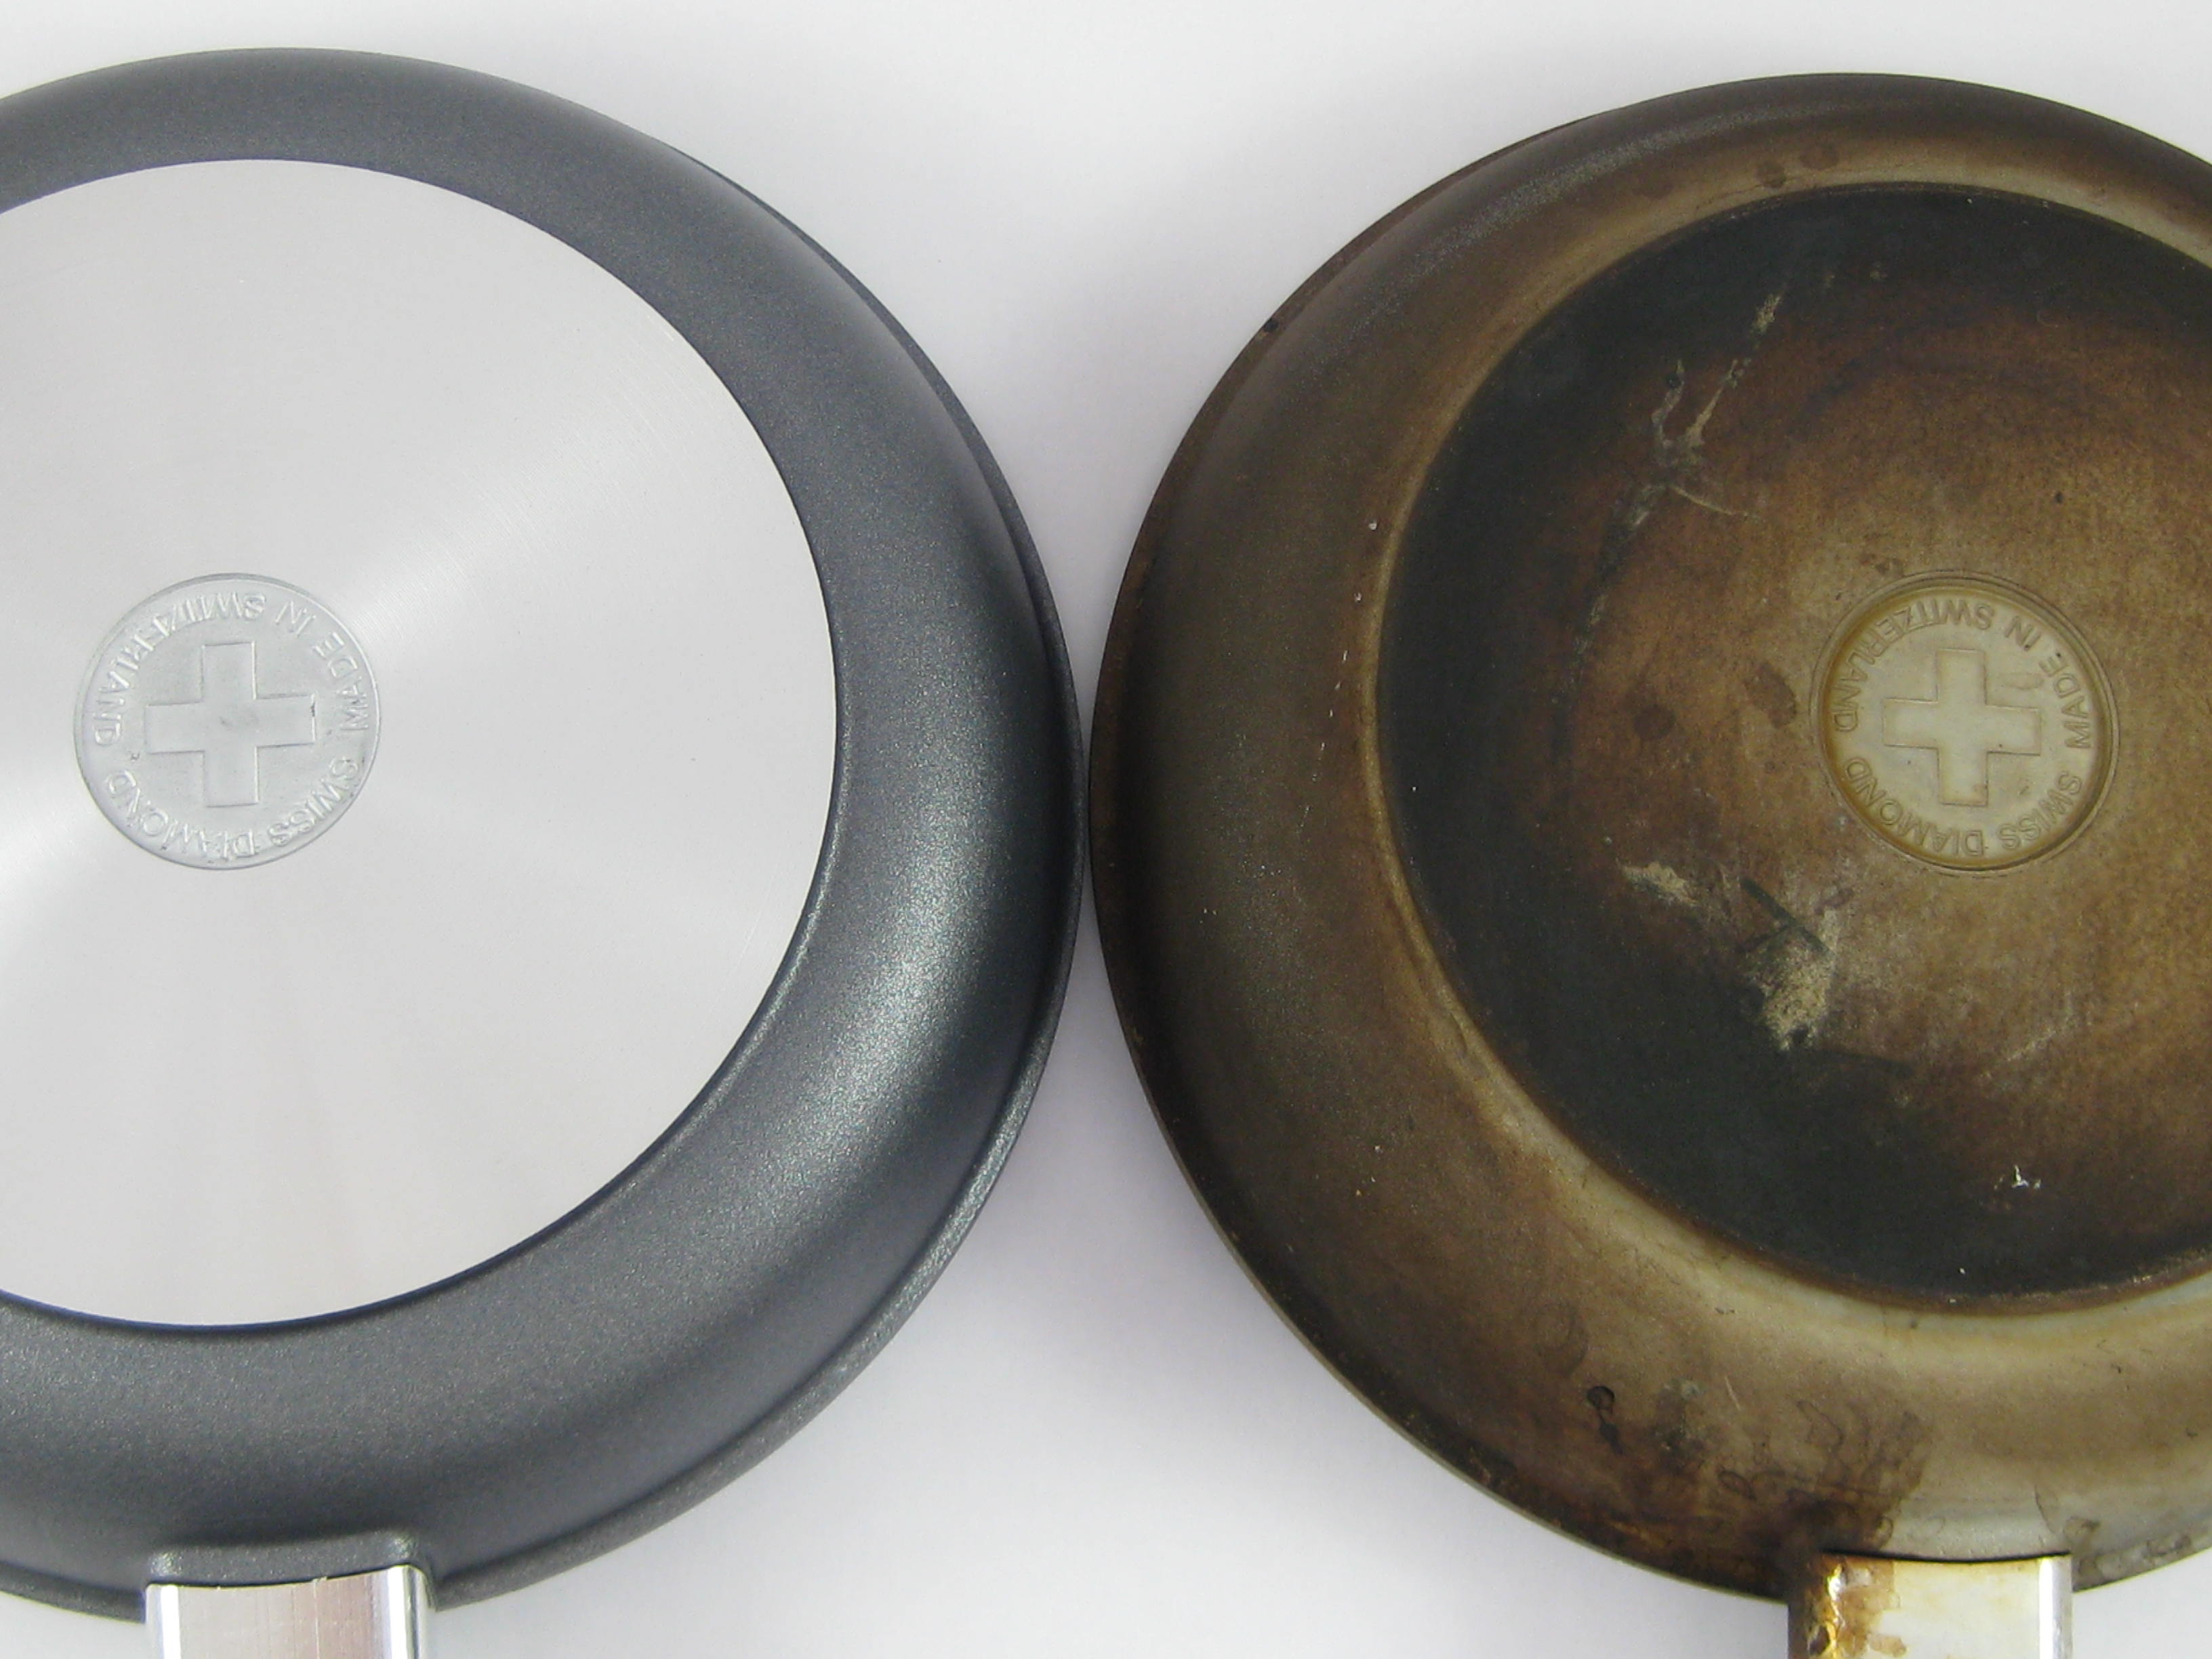 Cleaning Swiss Diamond Cookware